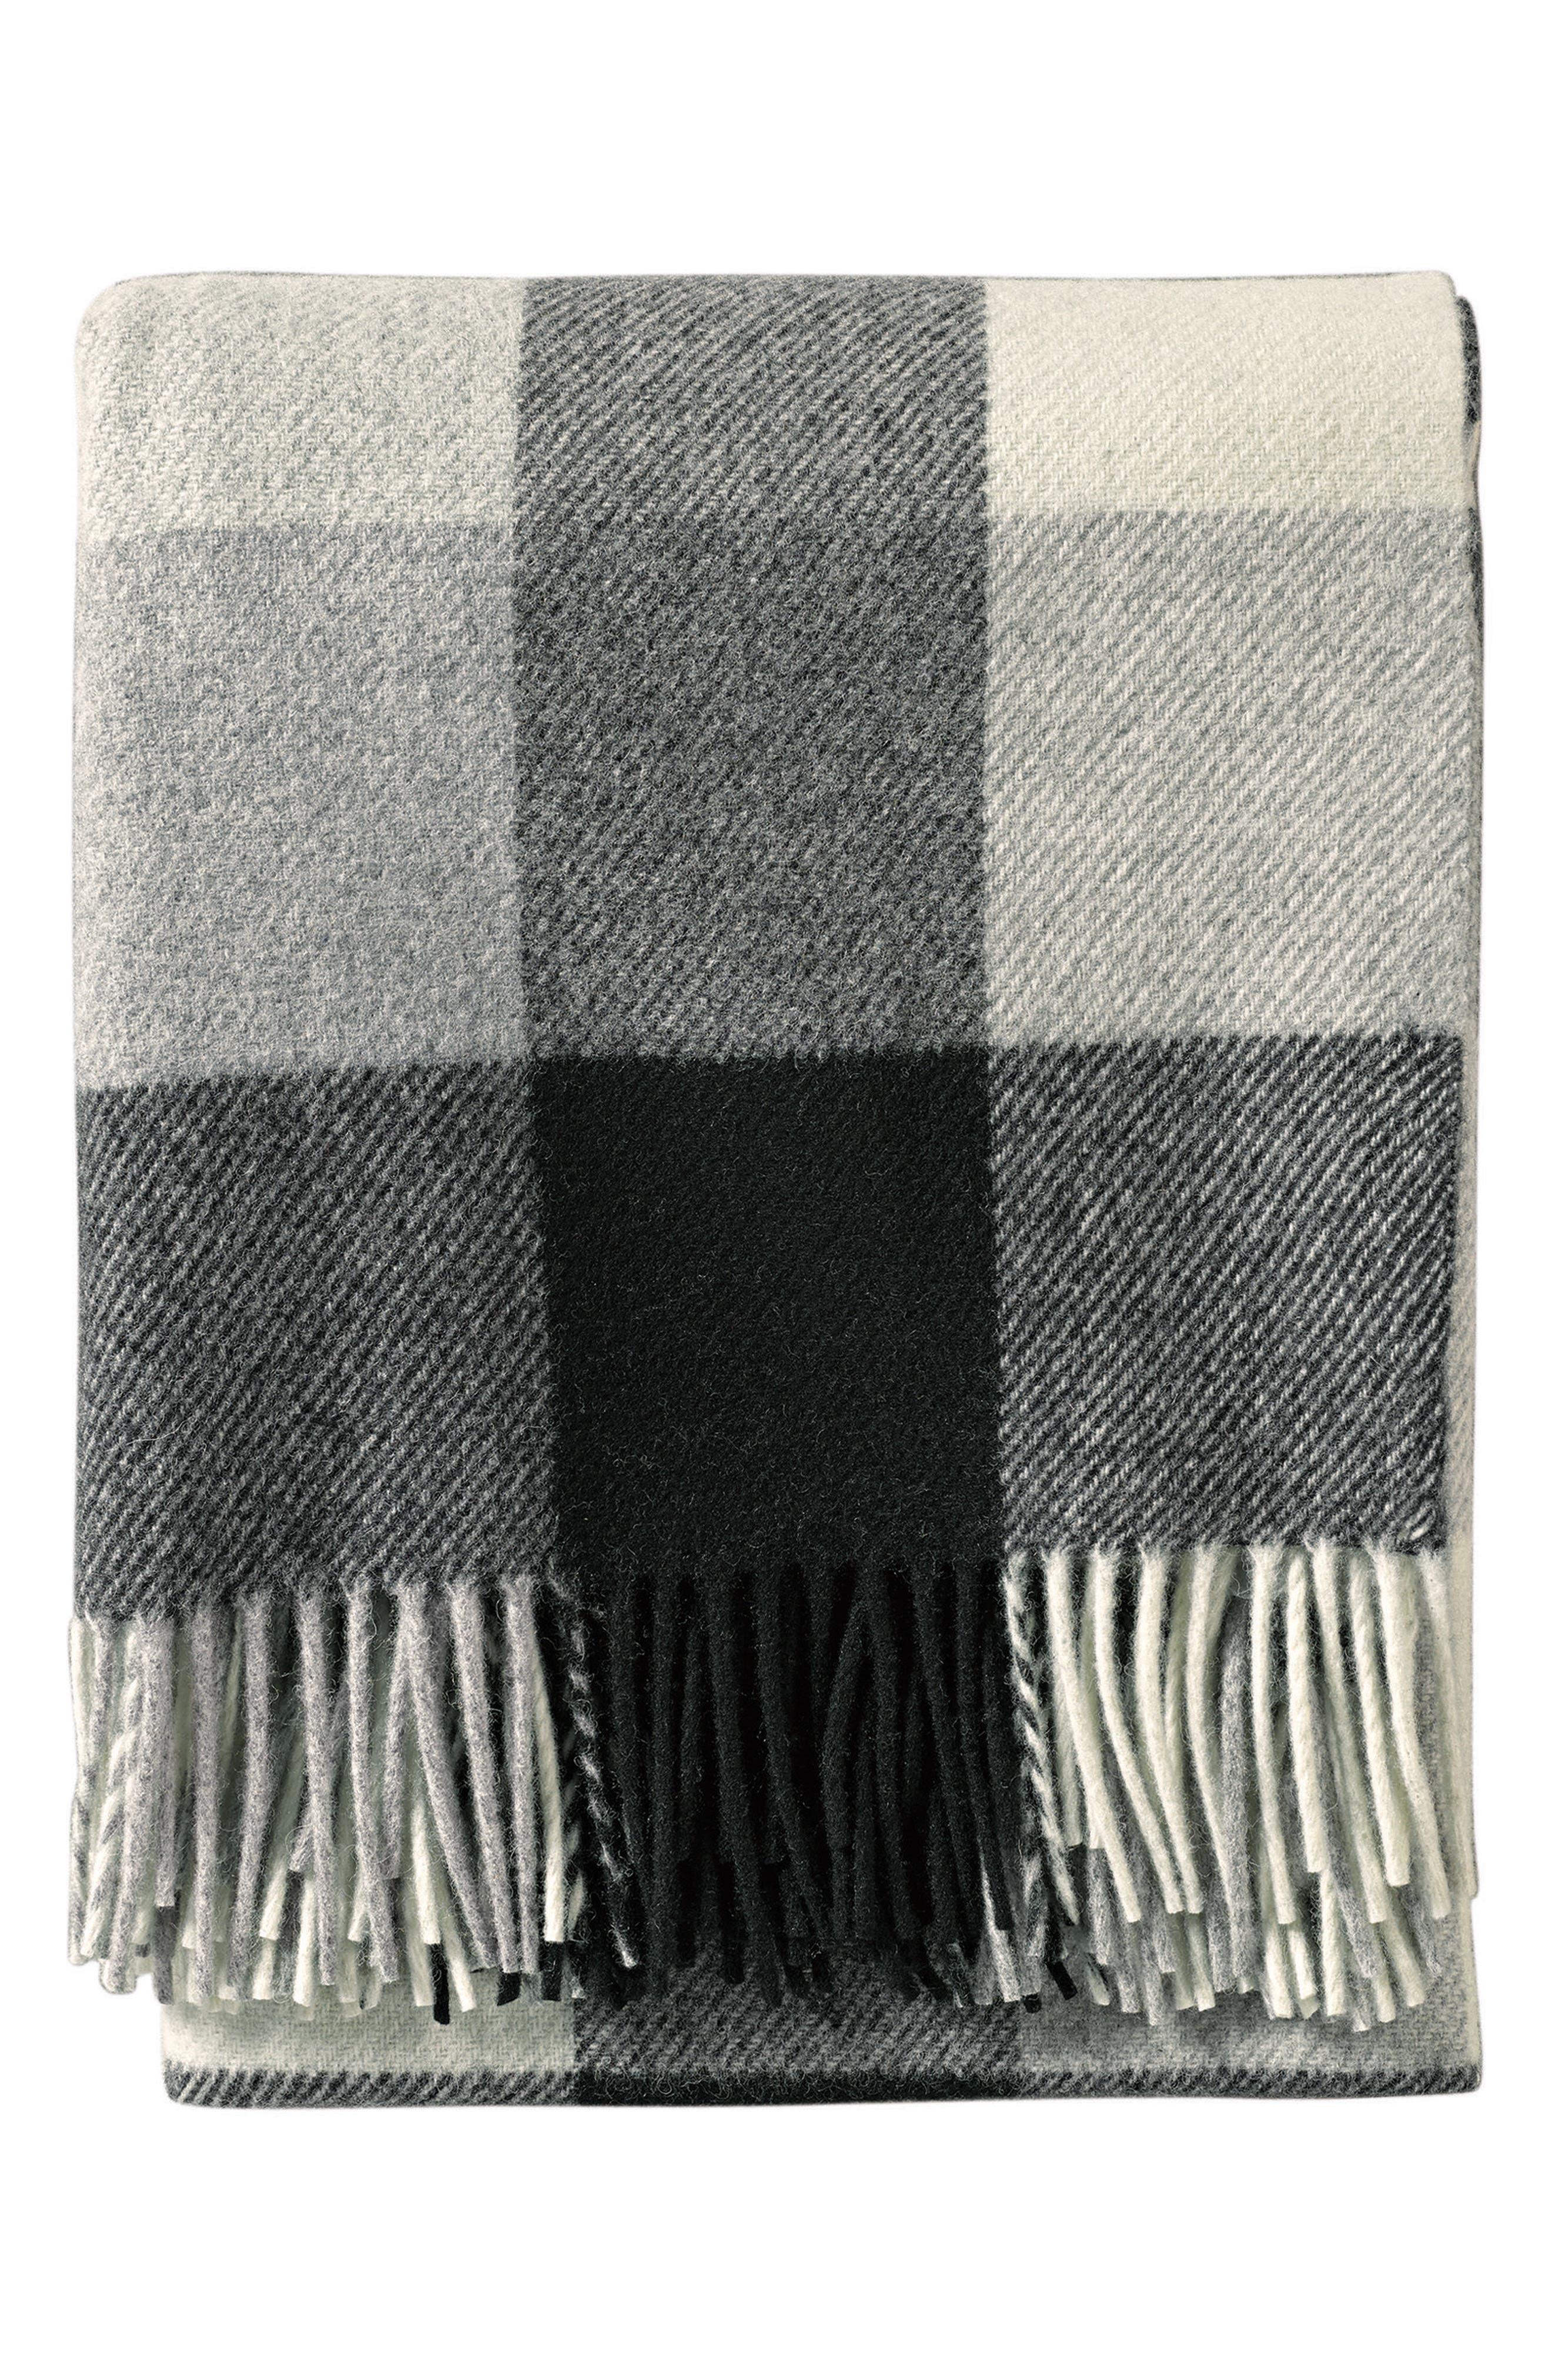 Plaid Washable Wool Throw,                         Main,                         color, BLACK/ IVORY